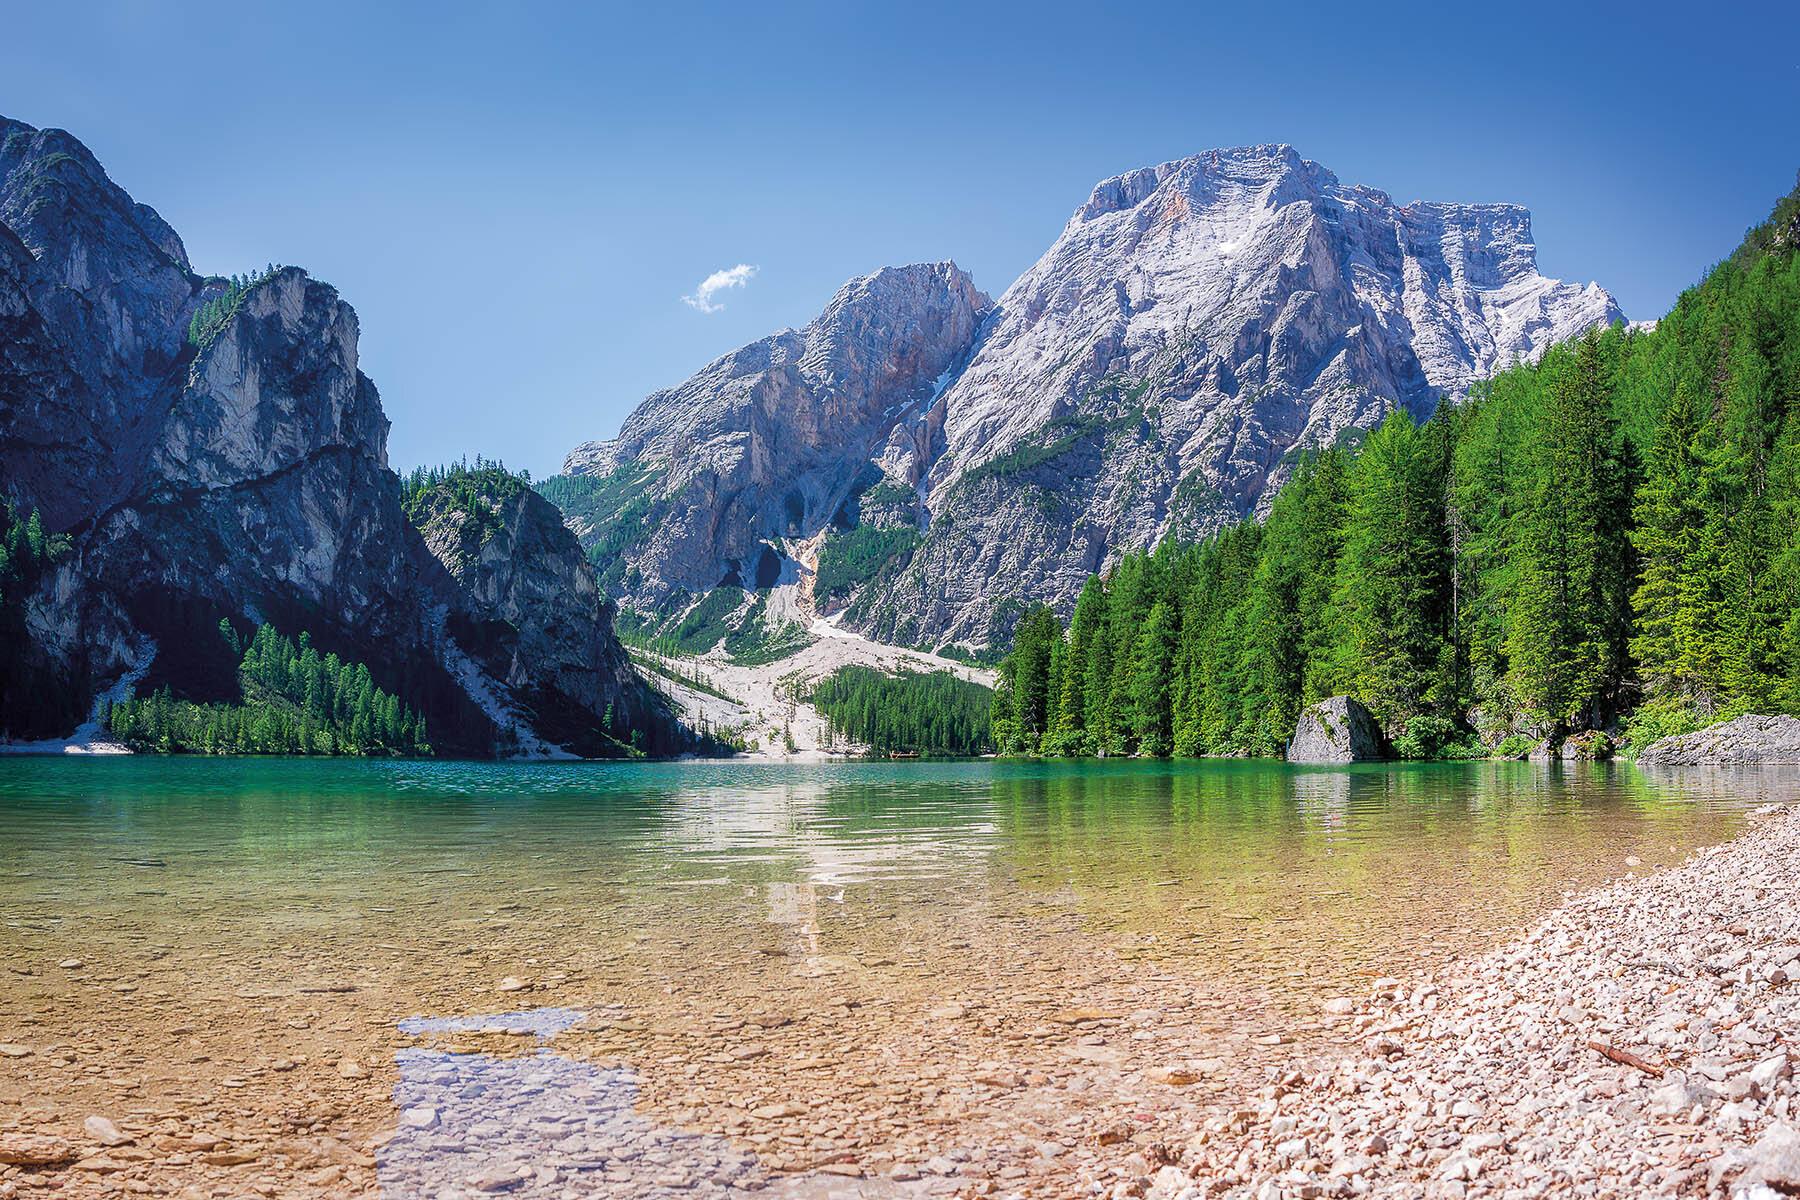 PlateART Duschrückwand mit Motiv Bergsee